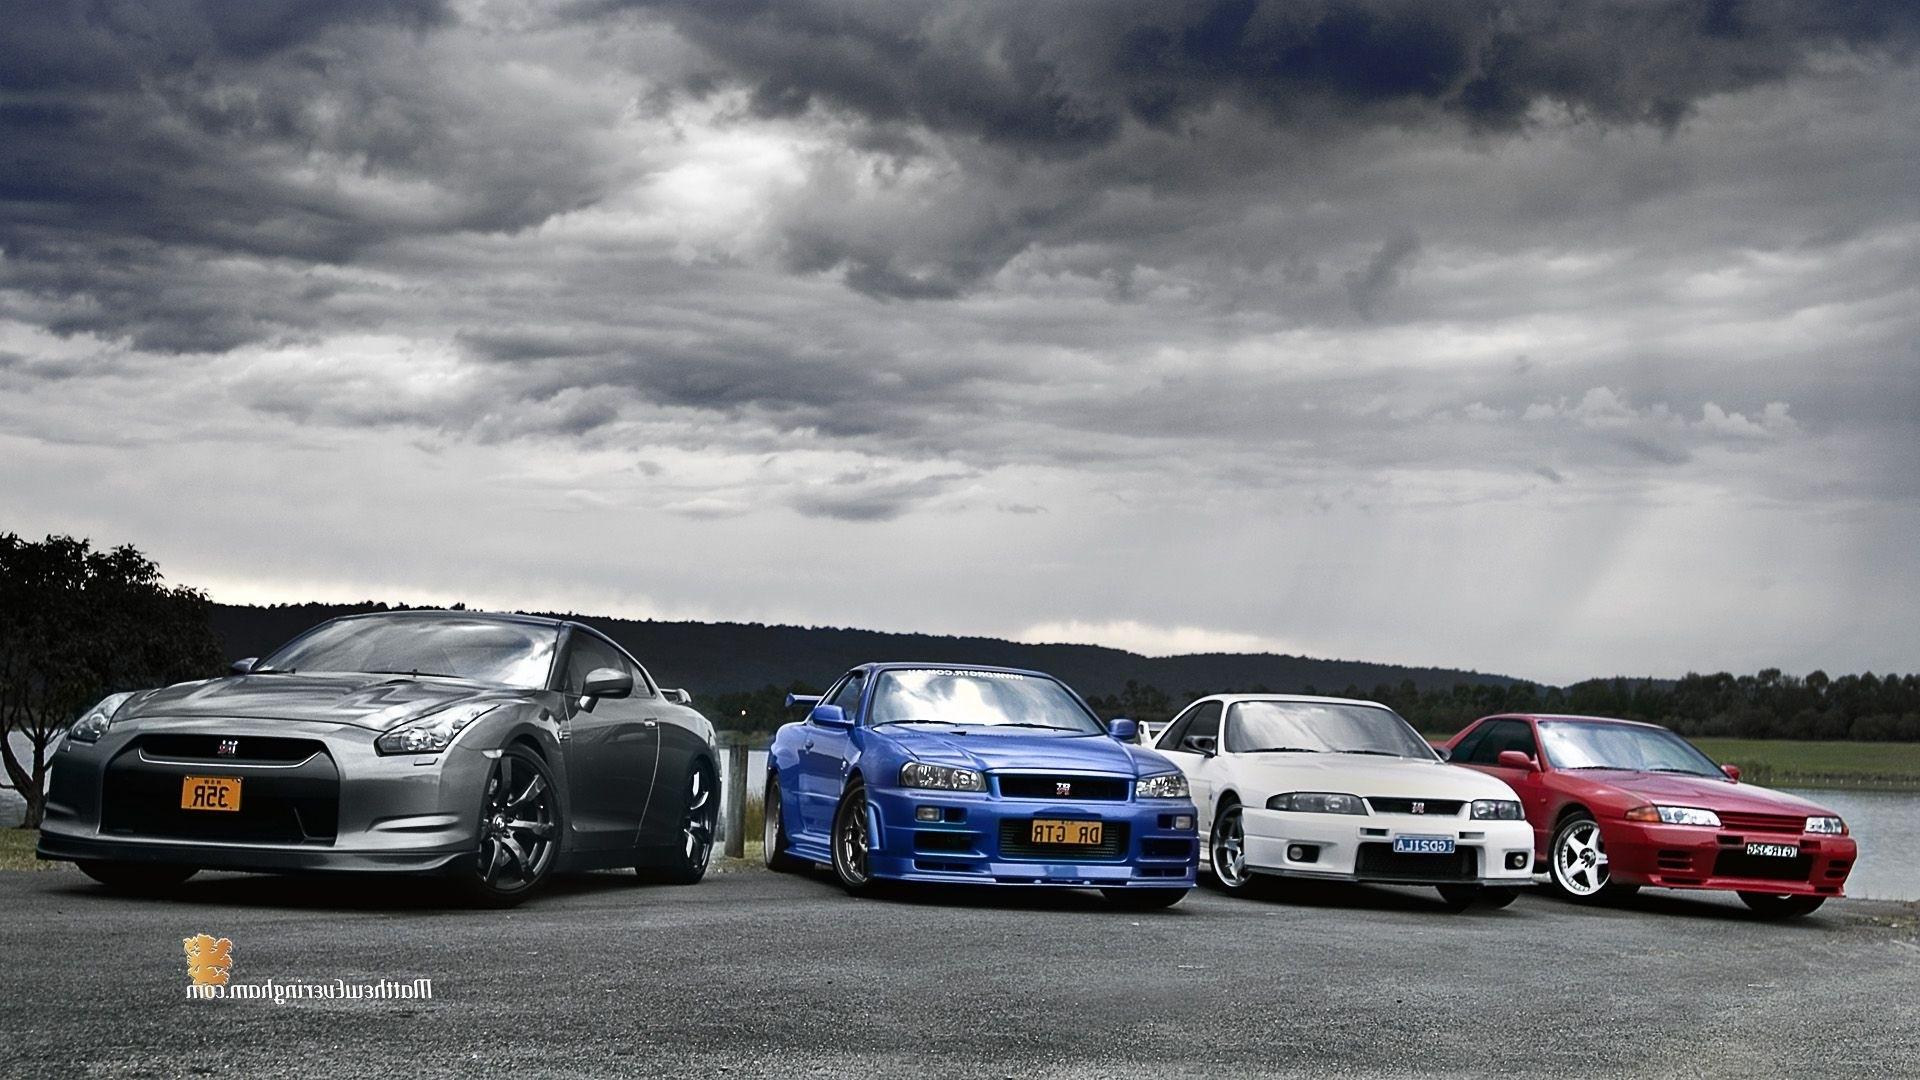 Skyline R Wallpapers Group Nissan Skyline GTR Wallpapers